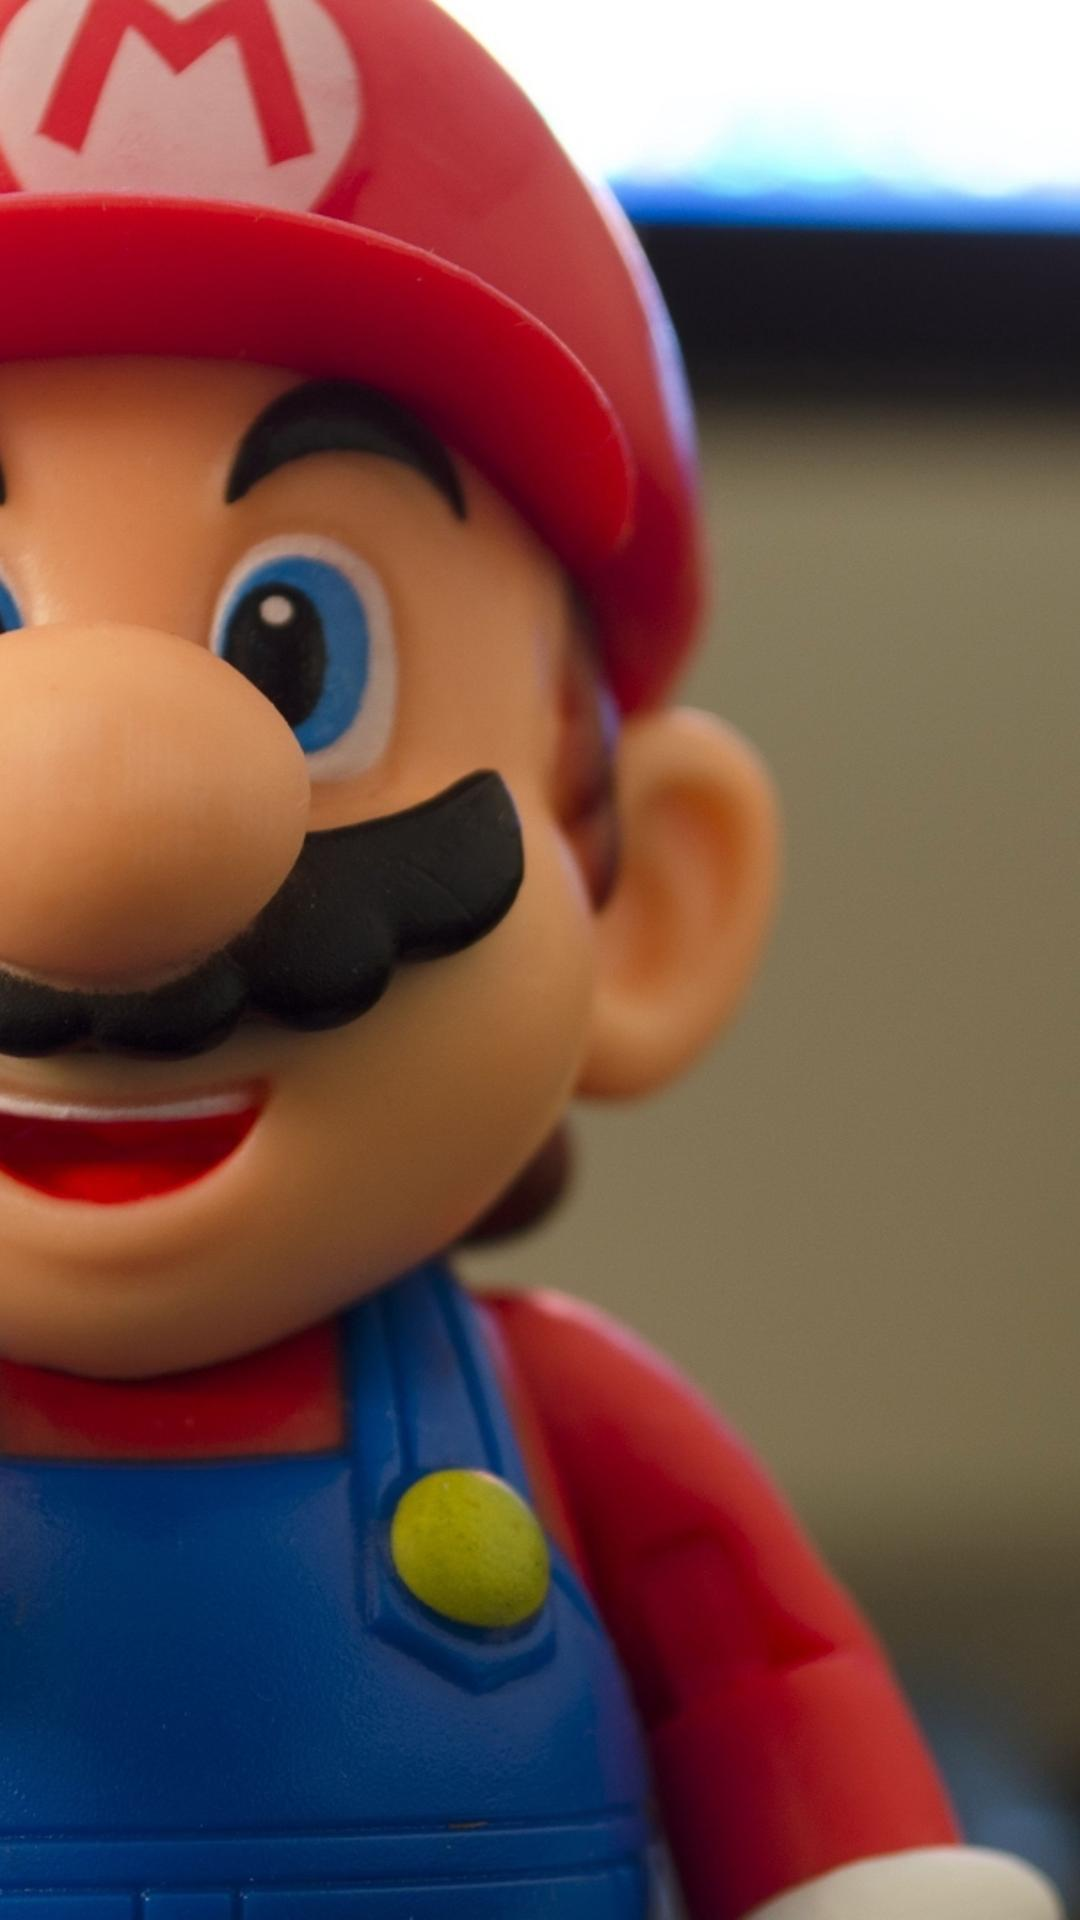 Hd wallpaper 1080x1920 - Super Mario Figurine Hd Game Character Wallpaper Wallpaper Download 1080x1920